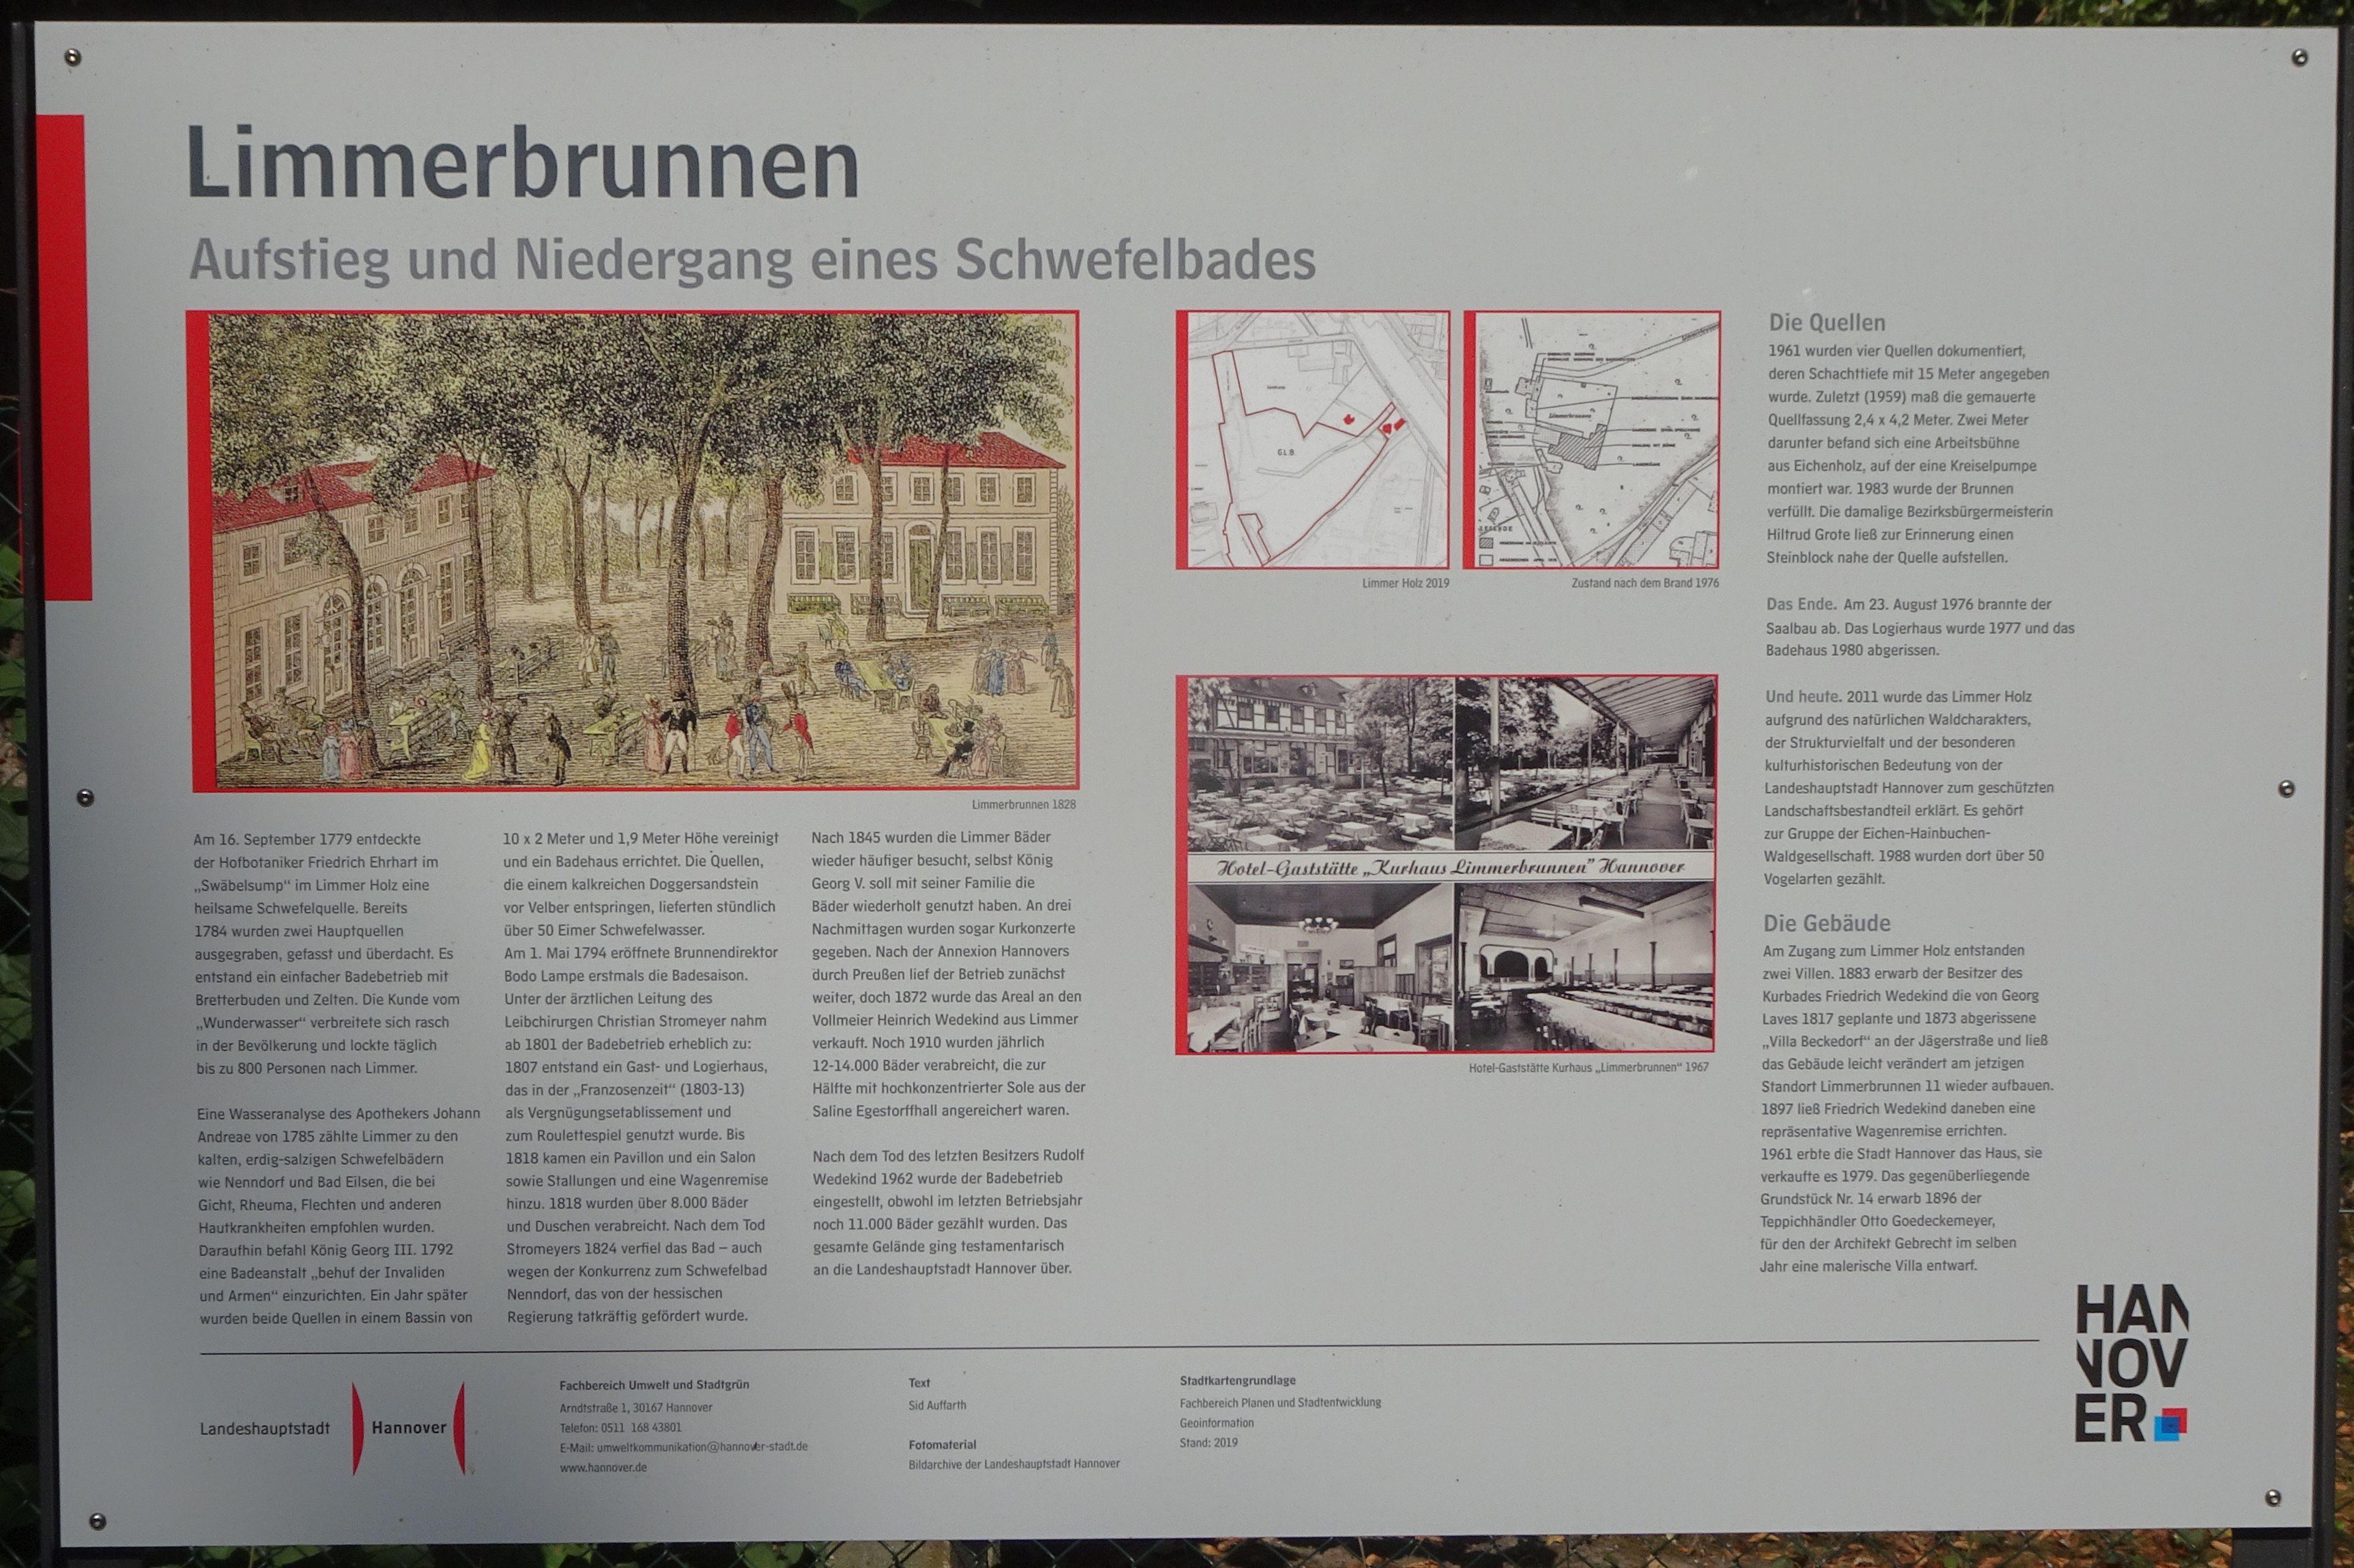 Limmerbrunnen Wikipedia